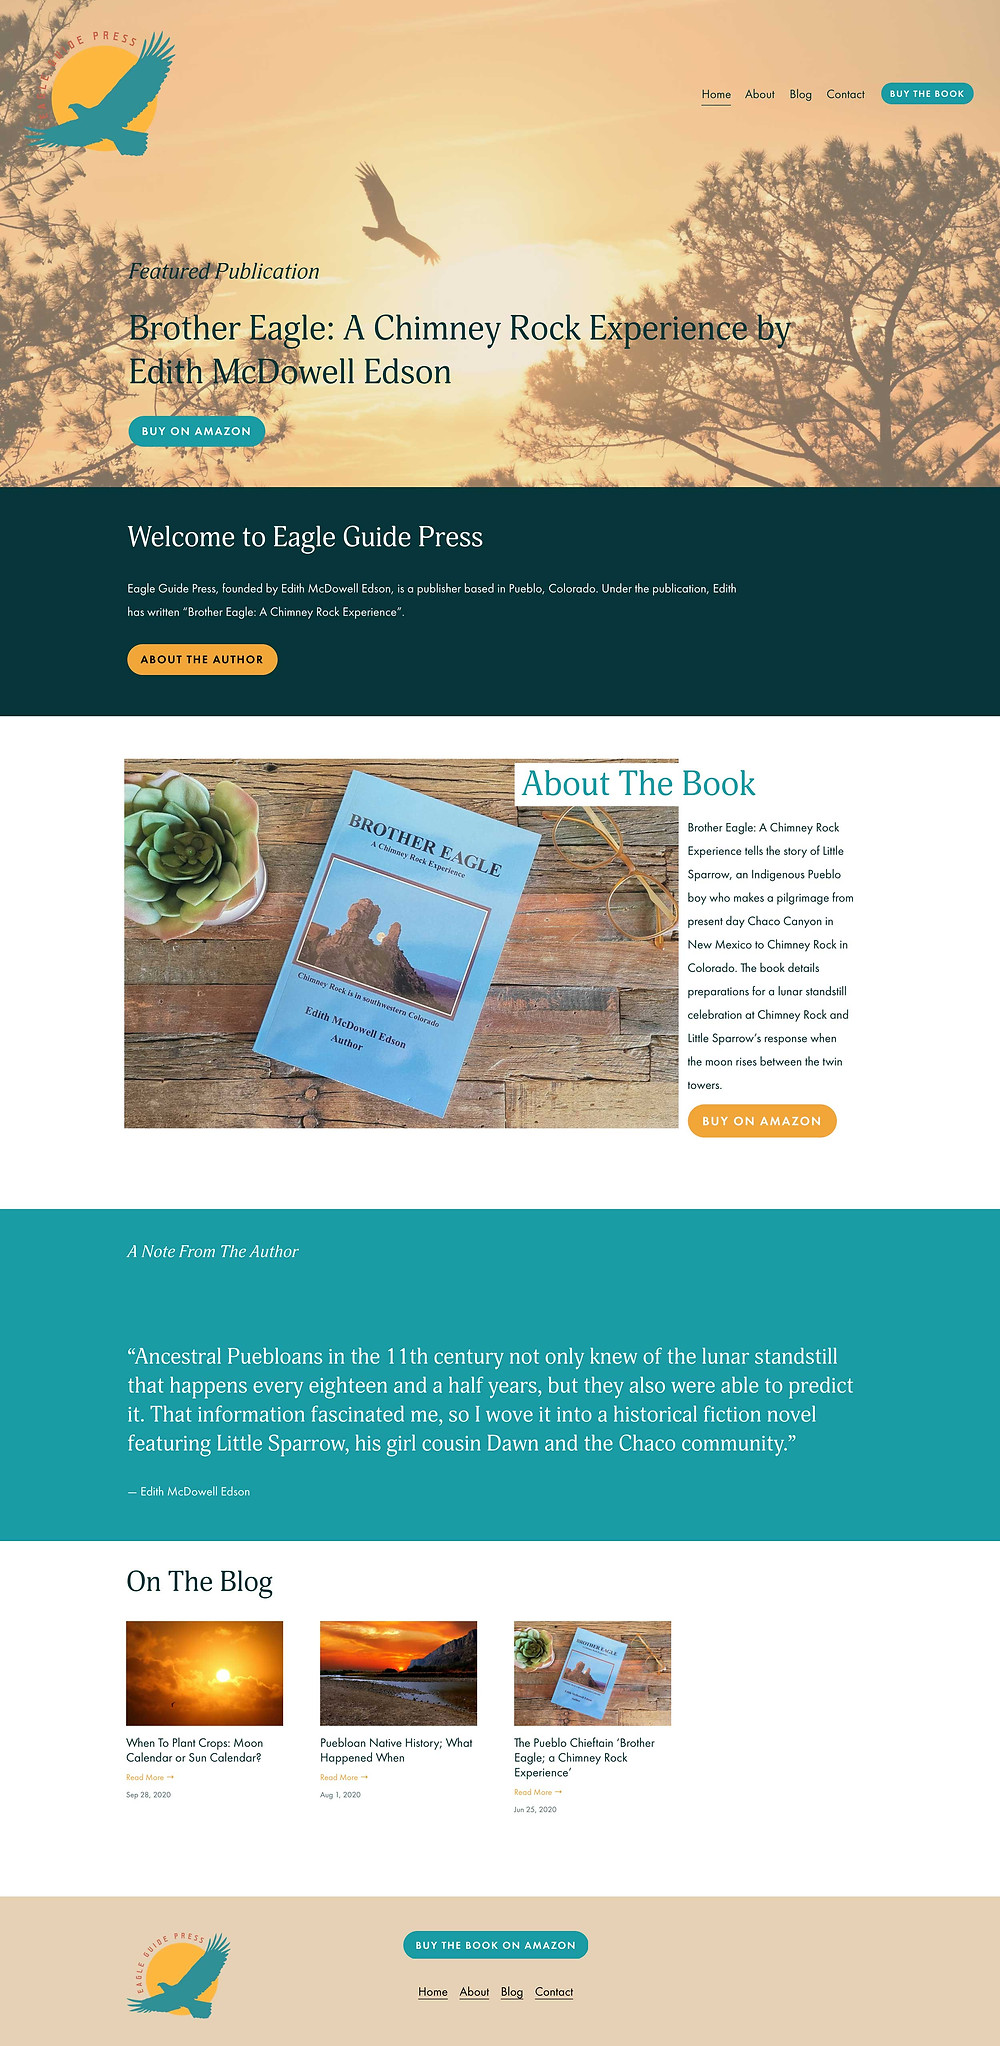 kat fox design website design canon city colorado eagle guide press